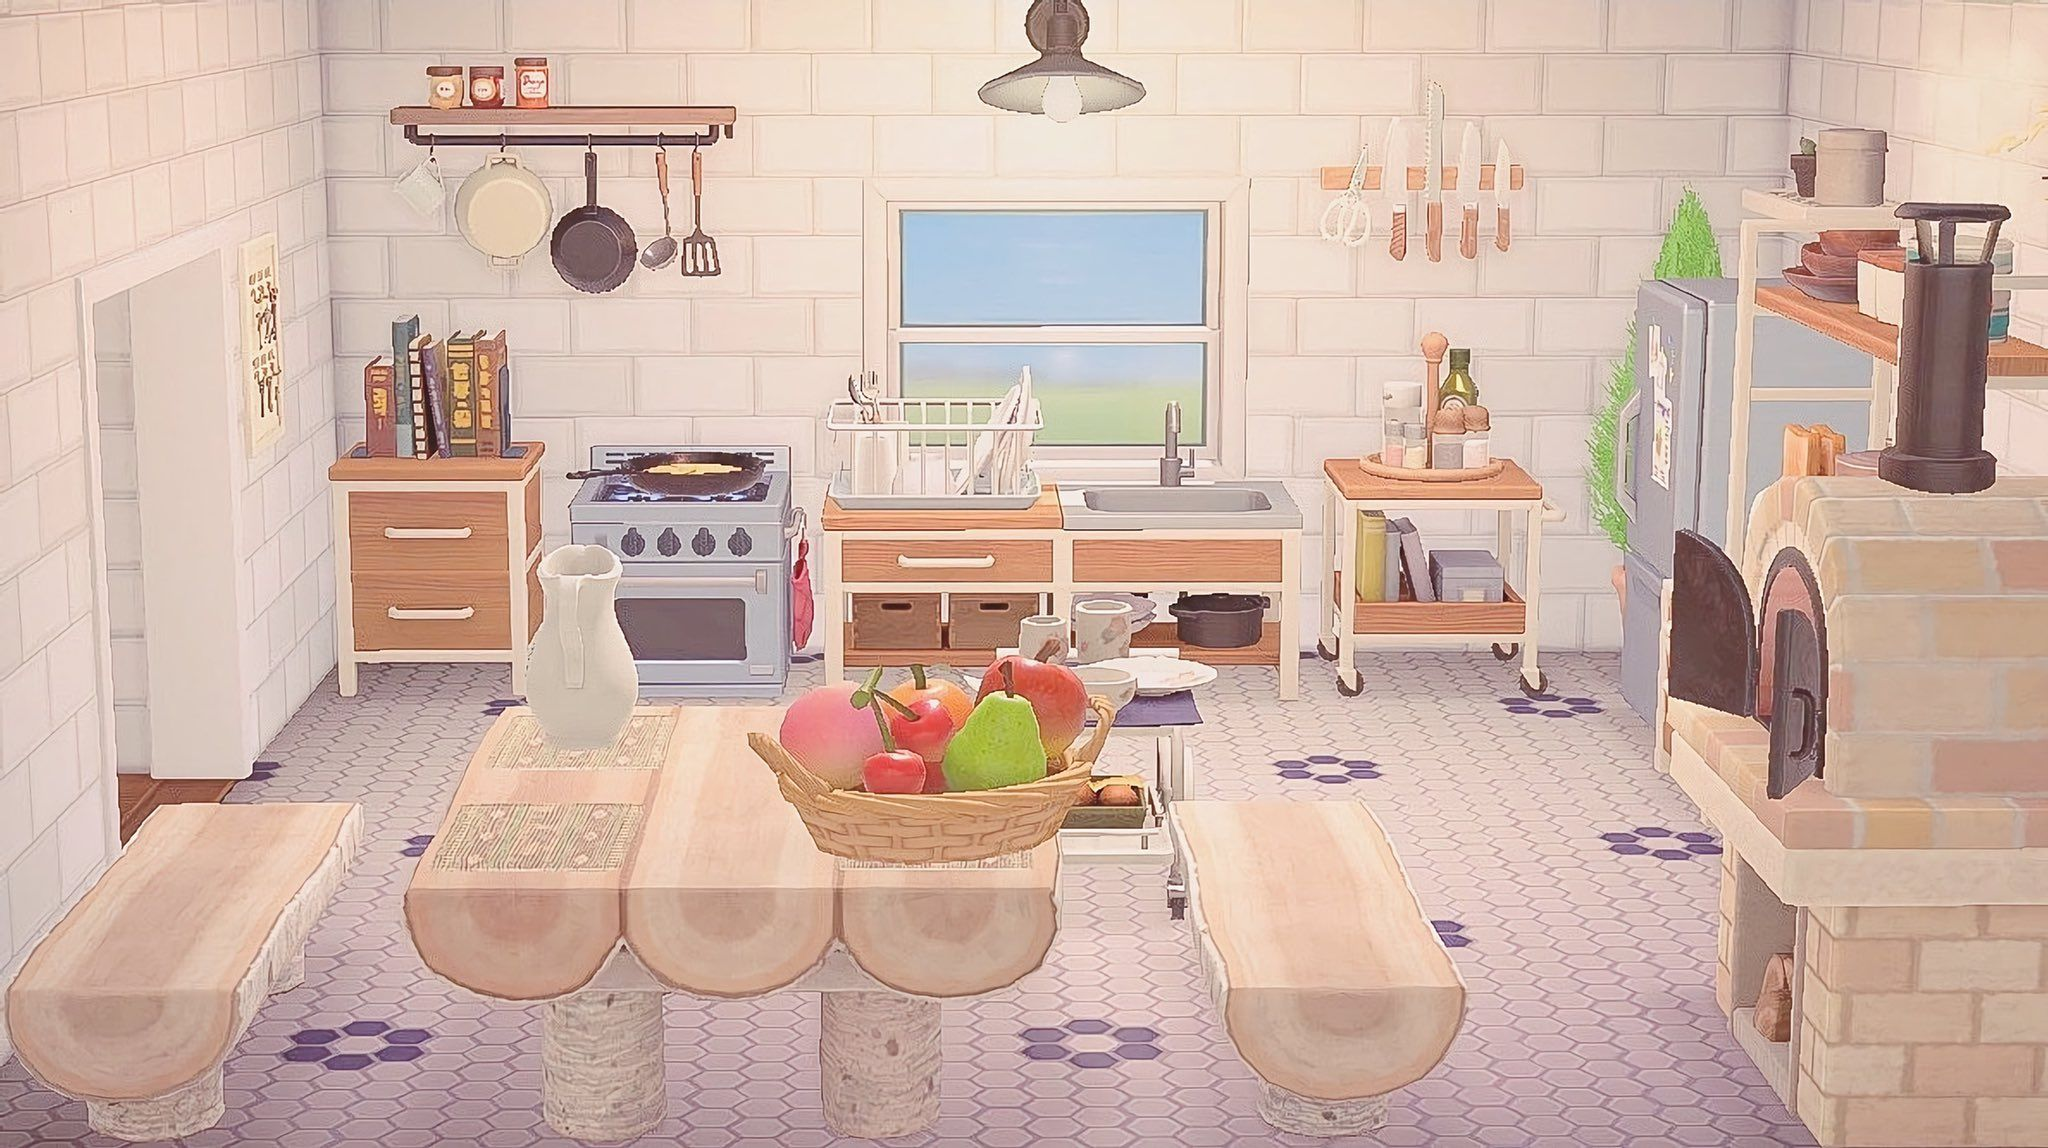 Kitchen Island Counter Animal Crossing New Horizons ... on Animal Crossing Kitchen Island  id=92693